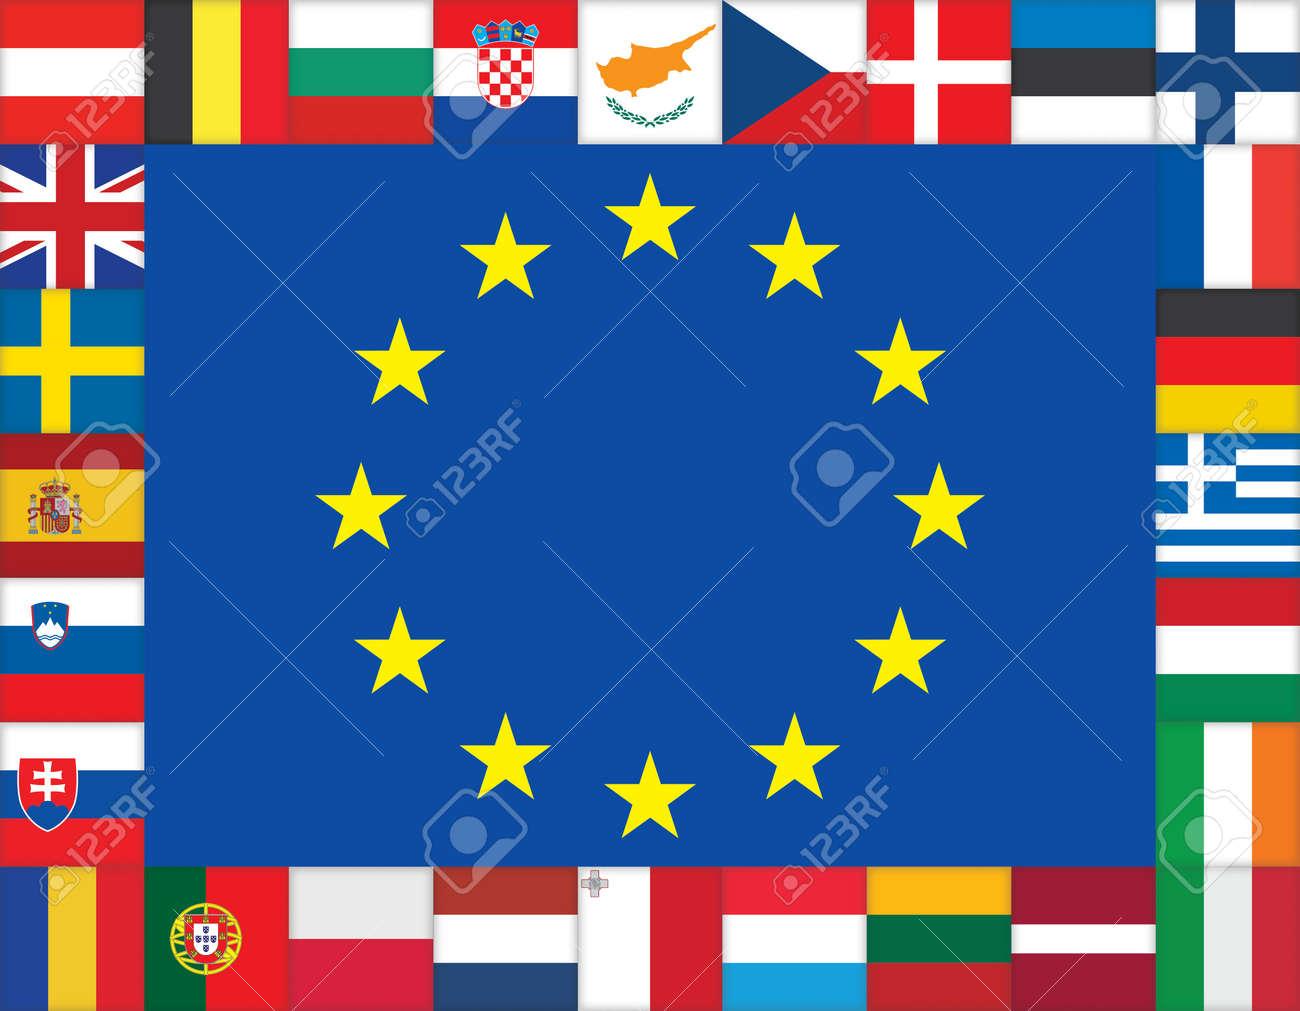 Europäische Union Flags Icons Rahmen Lizenzfrei Nutzbare ...